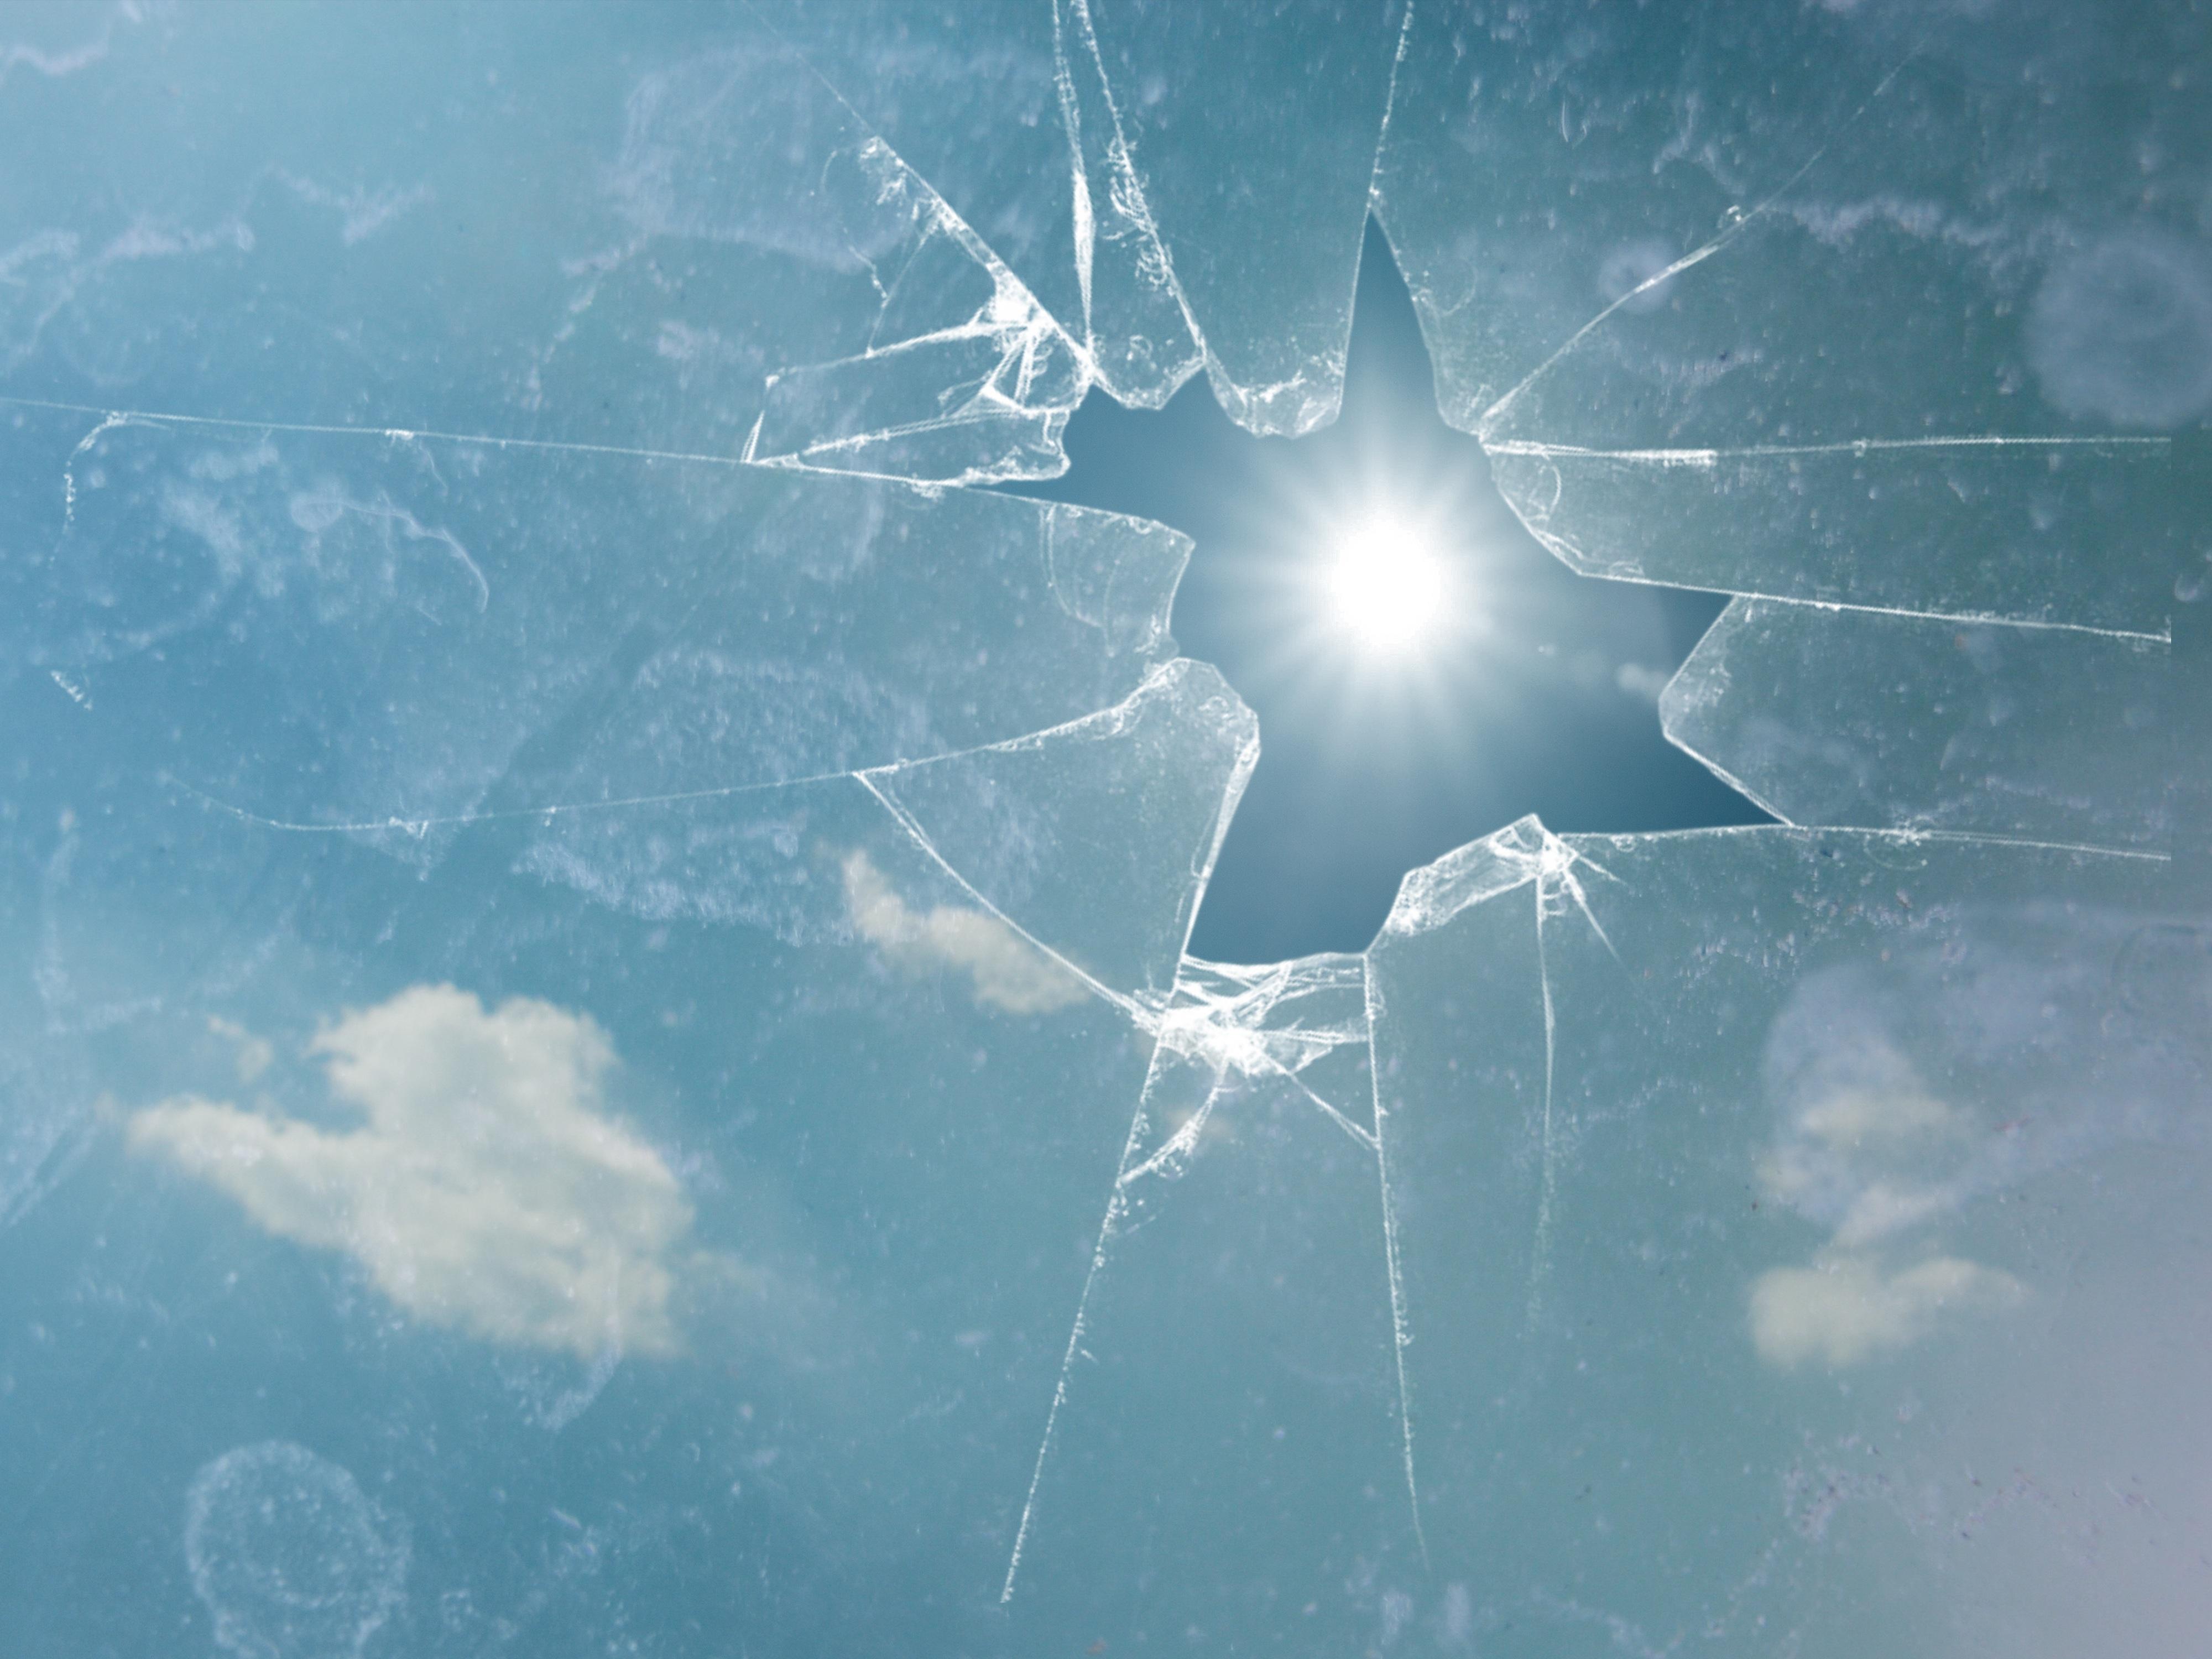 Free Images Wing Cloud Sky Sun Sunlight Glass Wind Ice